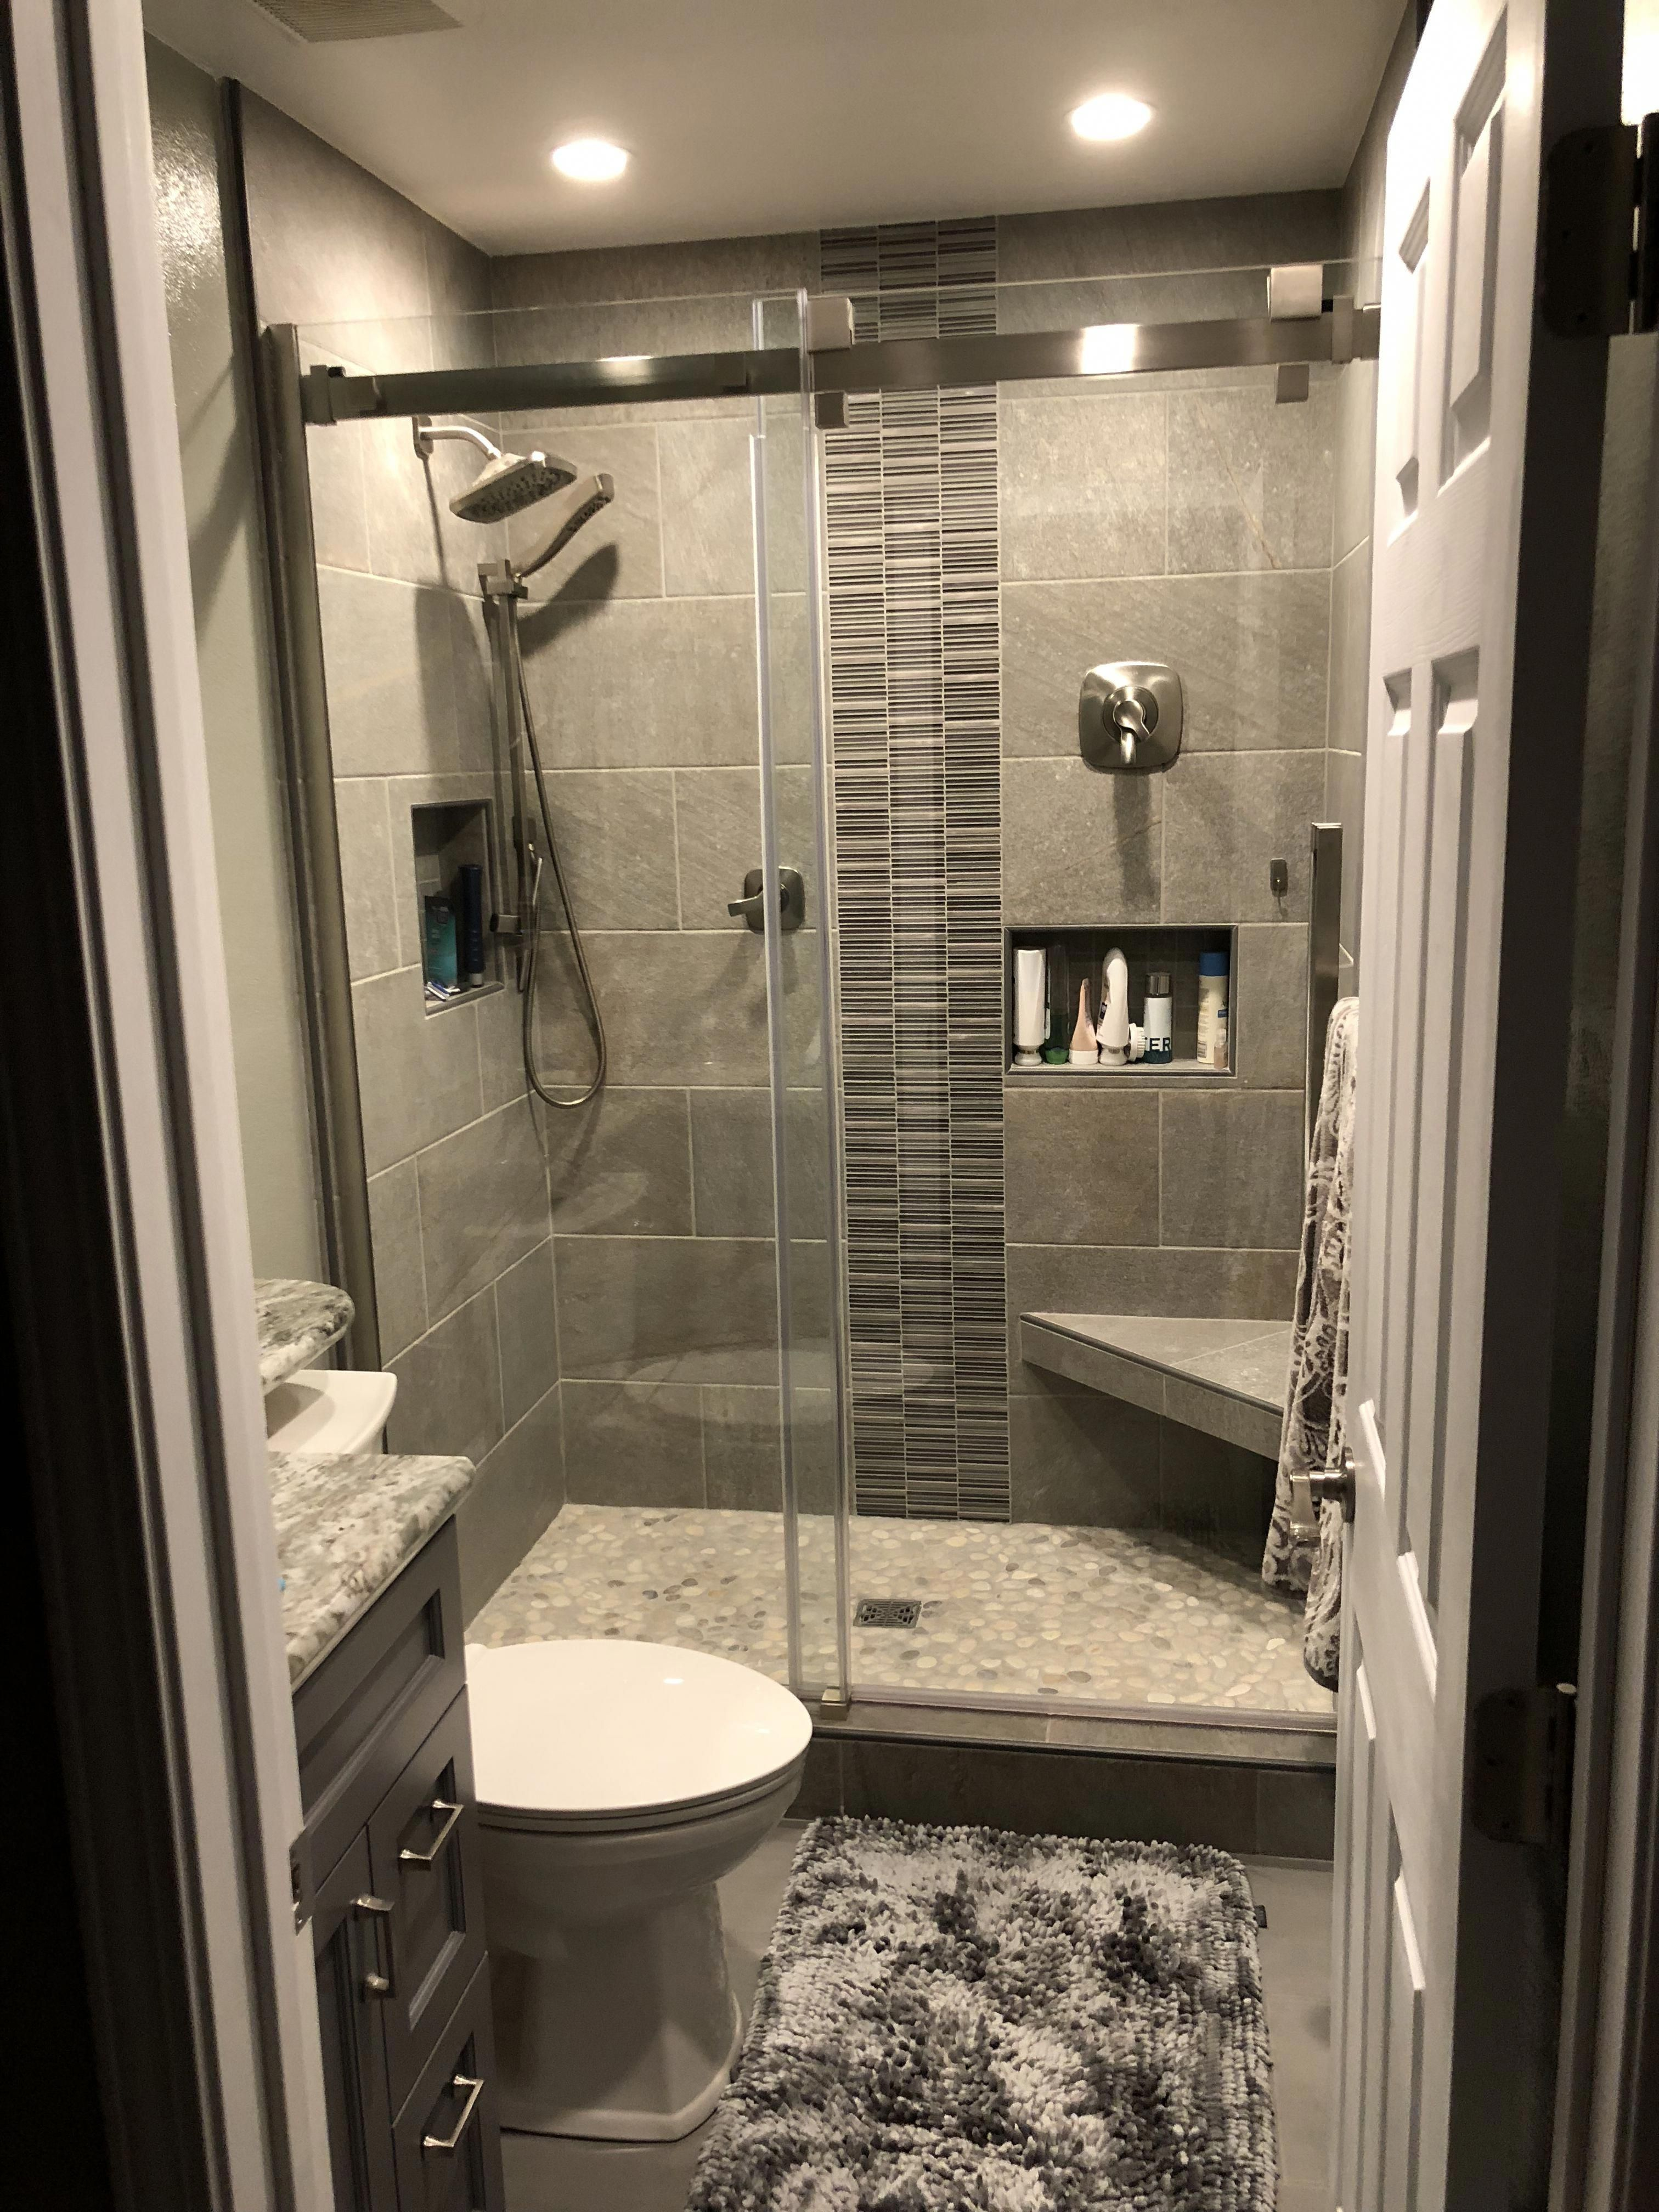 i really like doing this dyi bathroom ideas  small